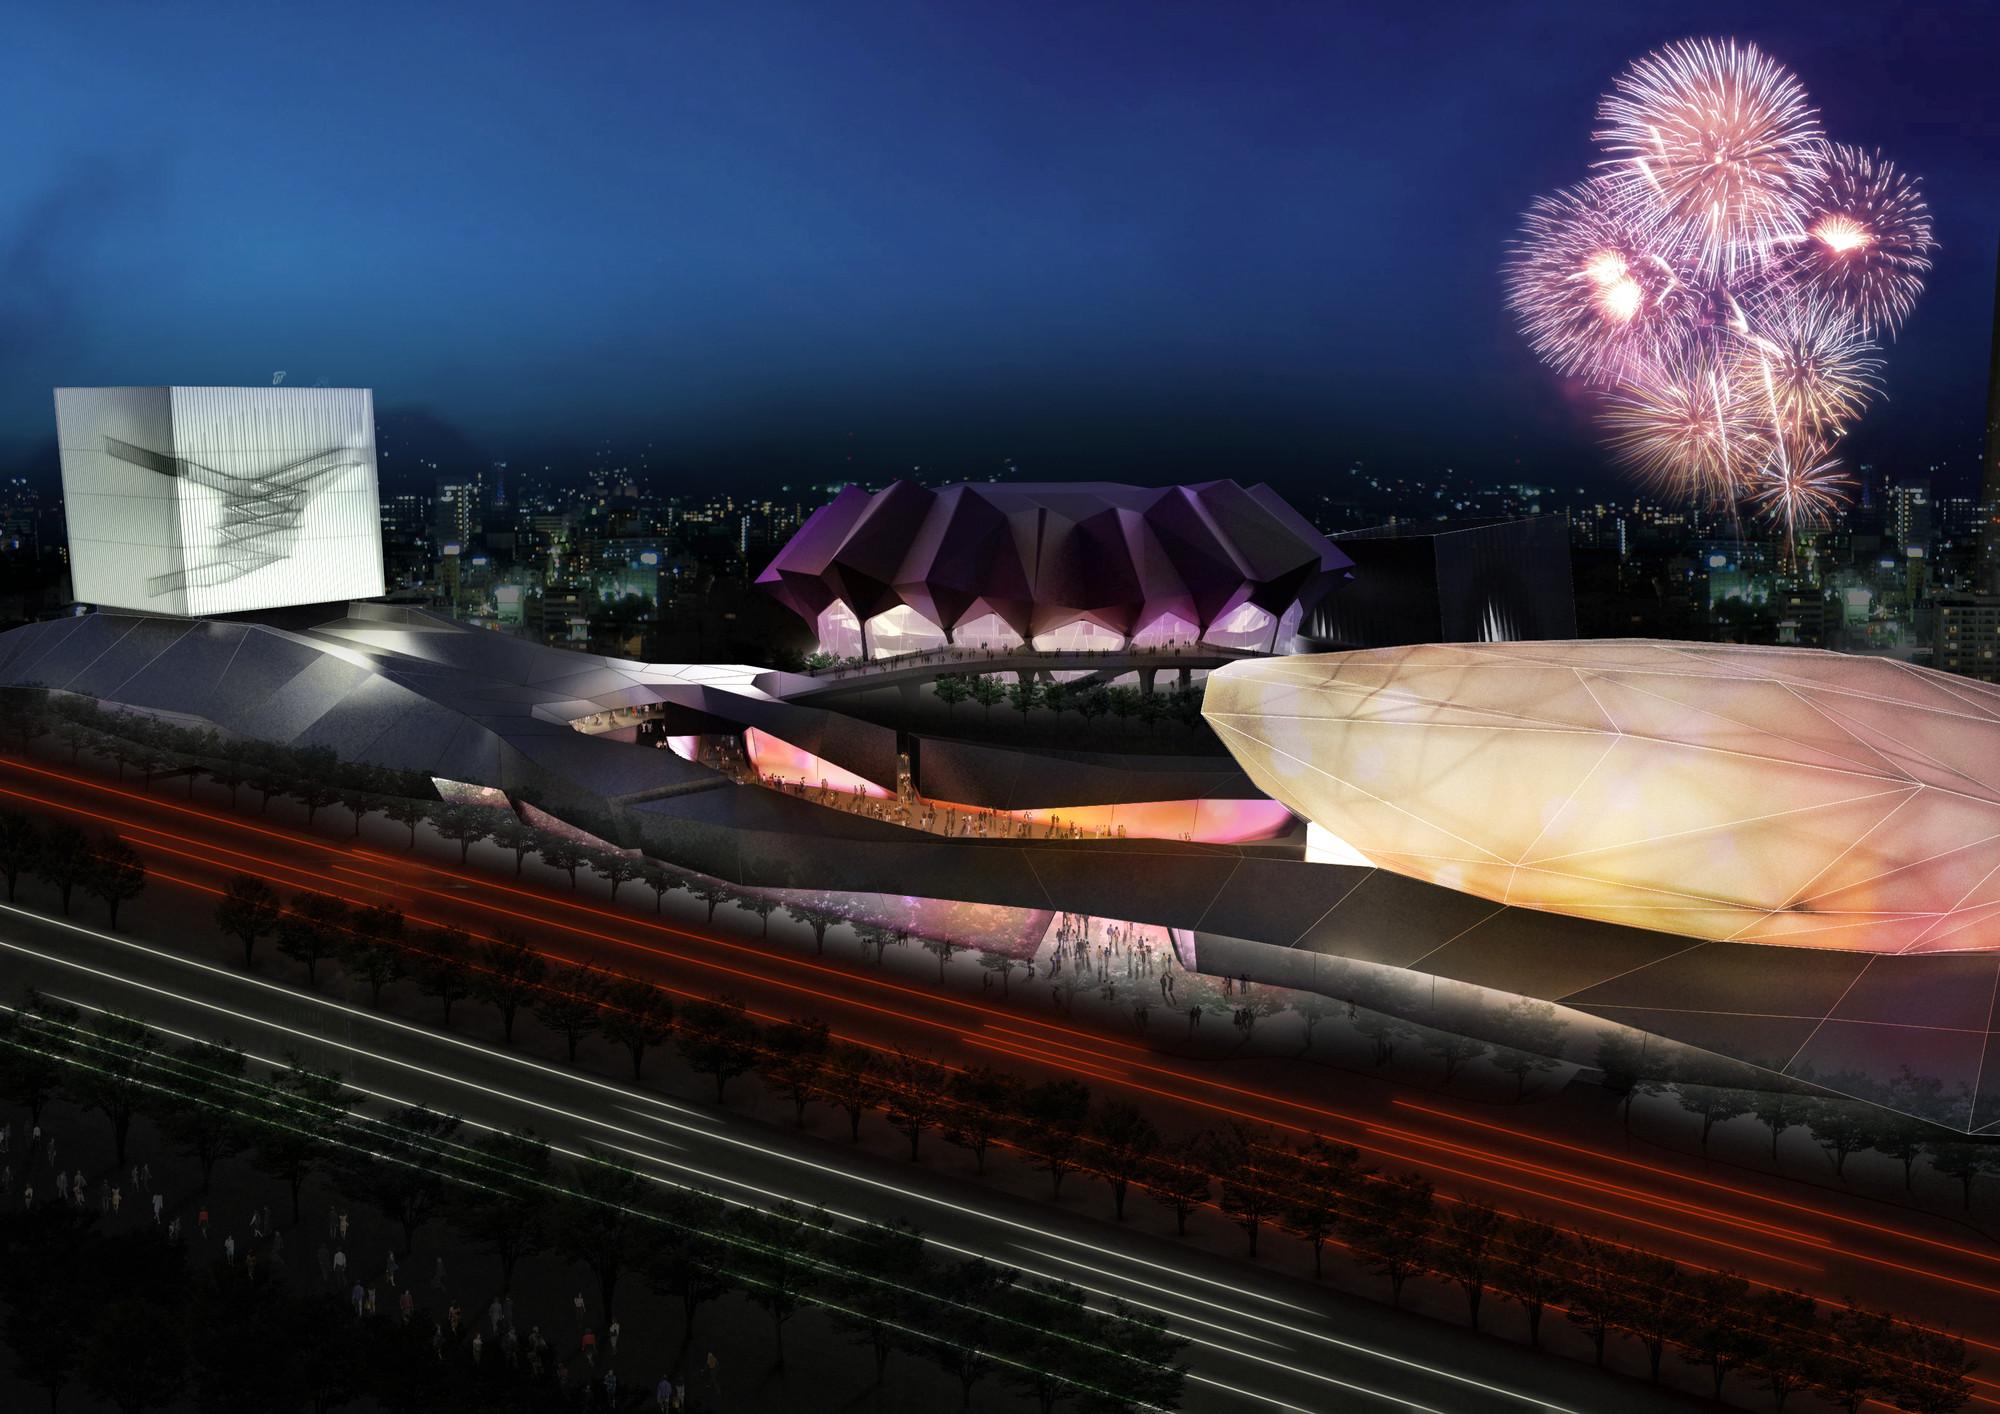 Reiser + Umemoto's Taipei Pop Music Center Breaks Ground in Taiwan, Courtesy of Reiser + Umemoto, RUR Architecture PC